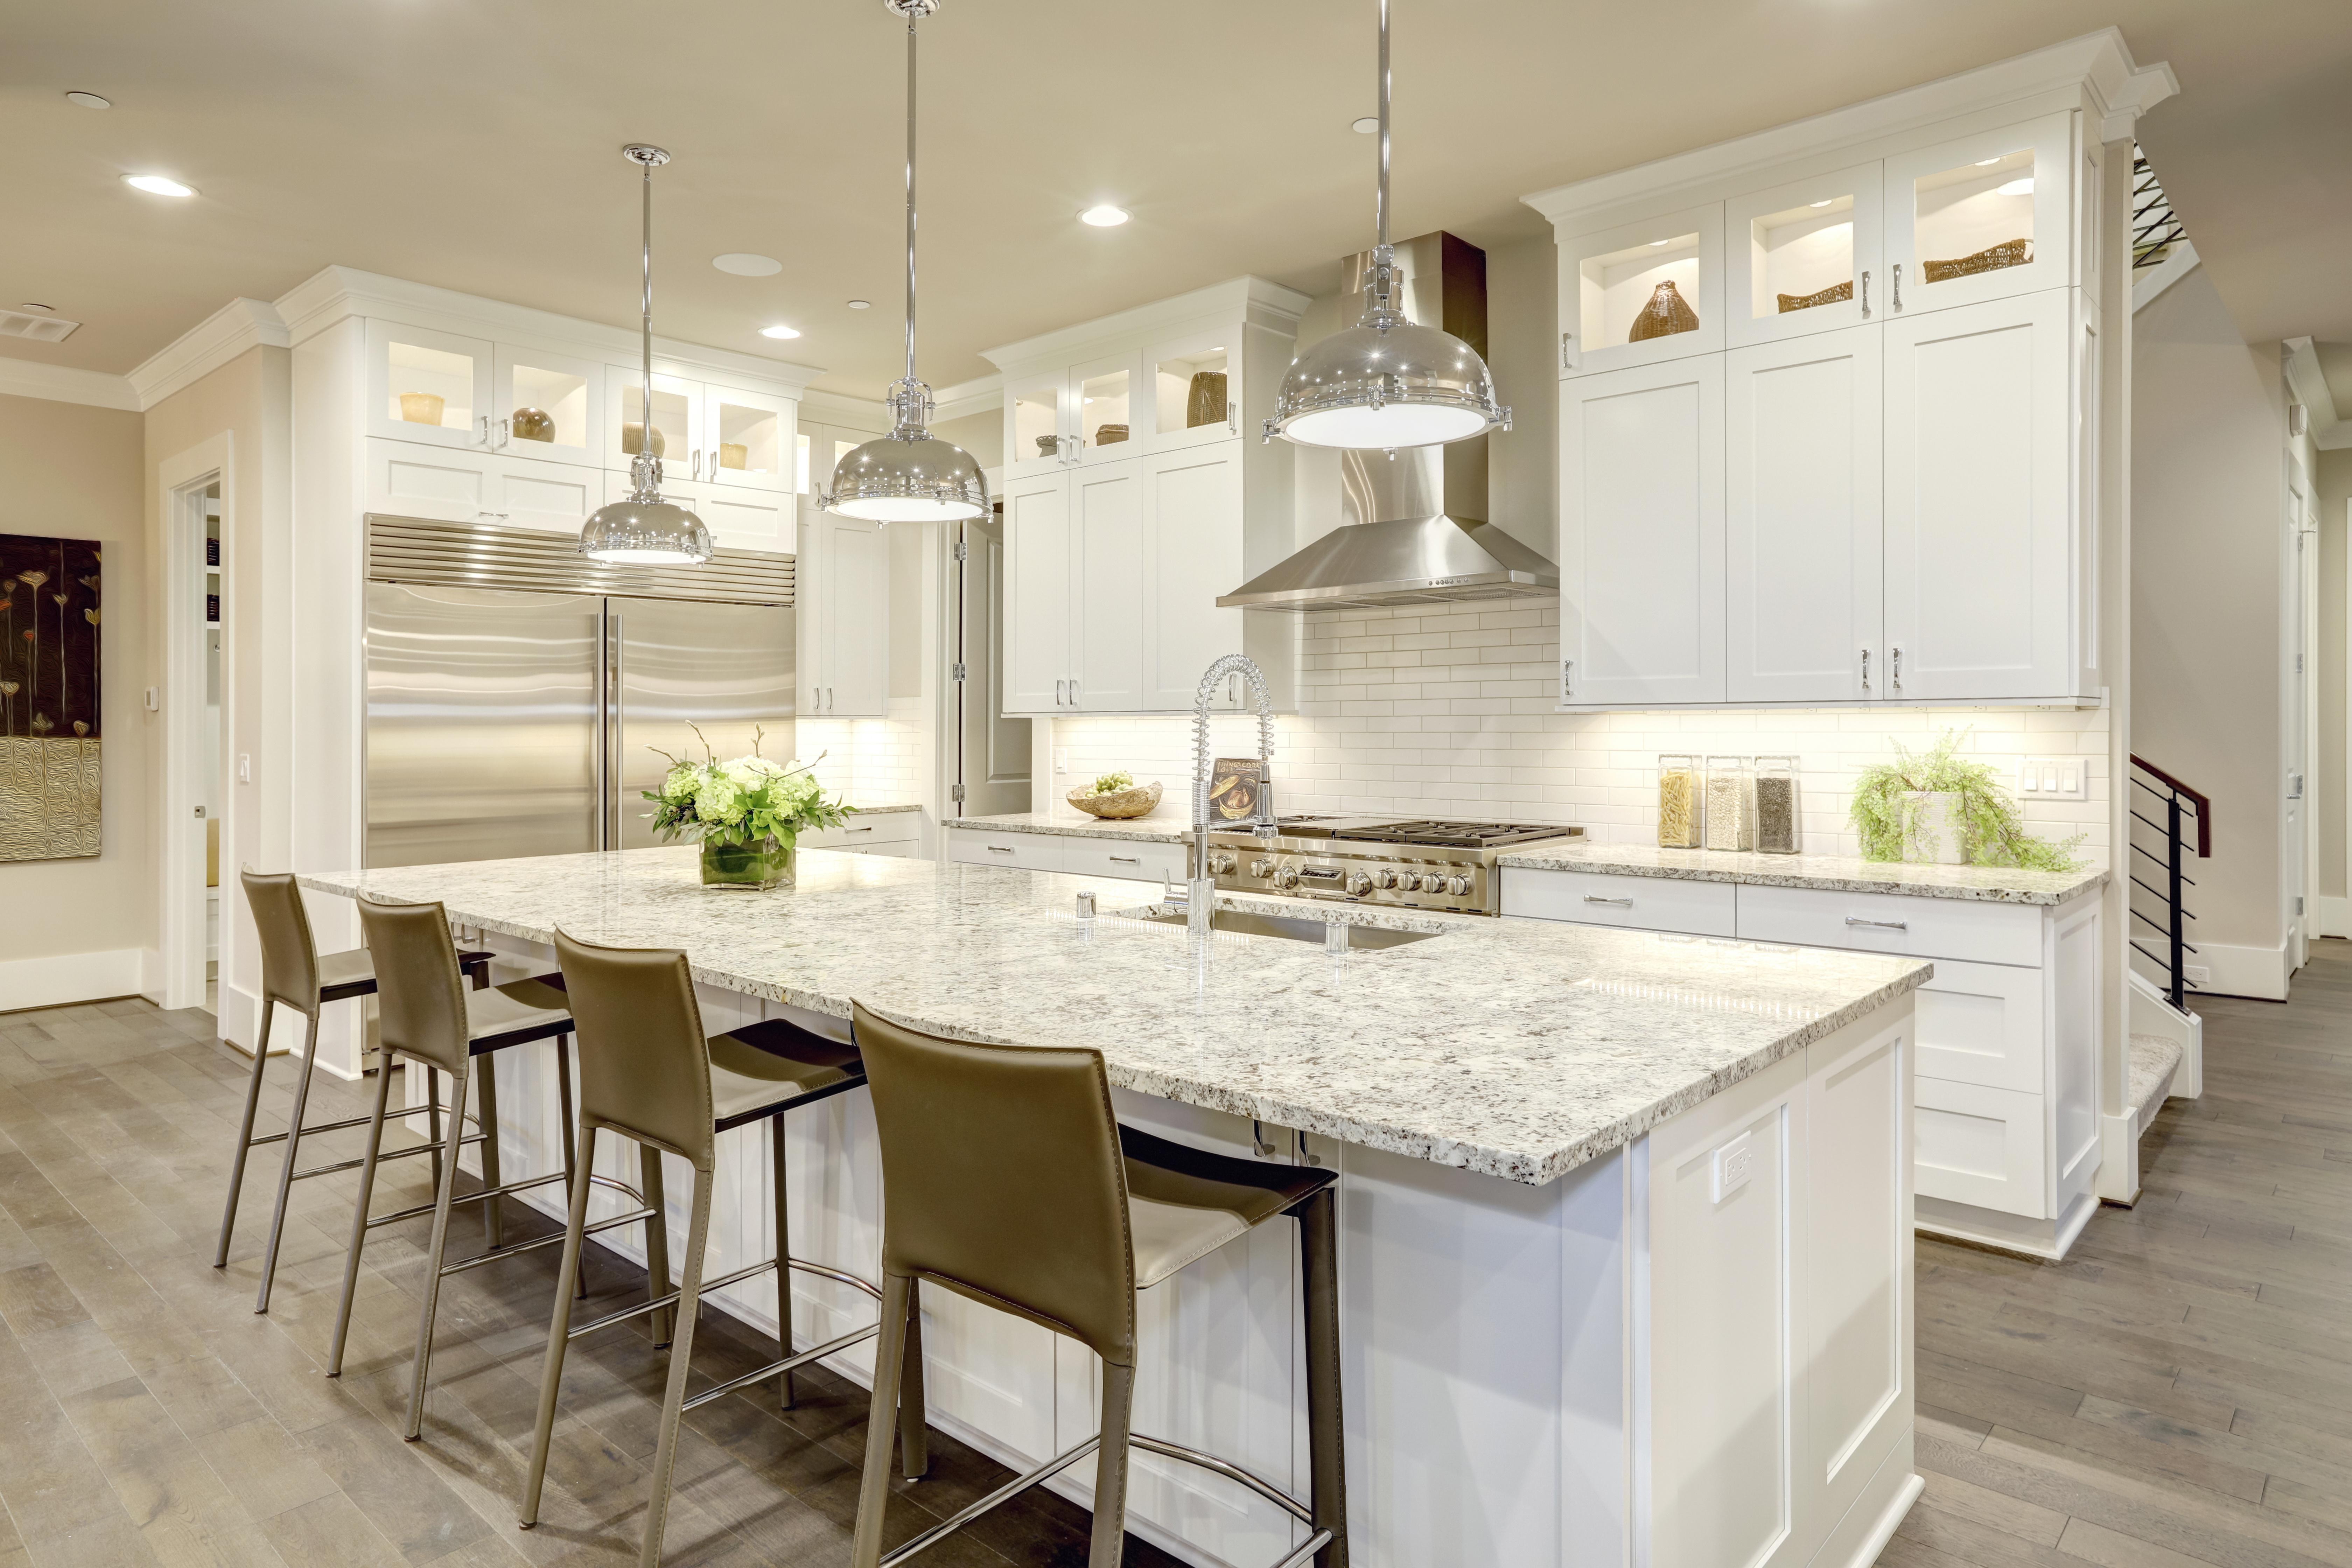 White kitchen design features large bar style kitchen island with granite countertop | Pierce Flooring